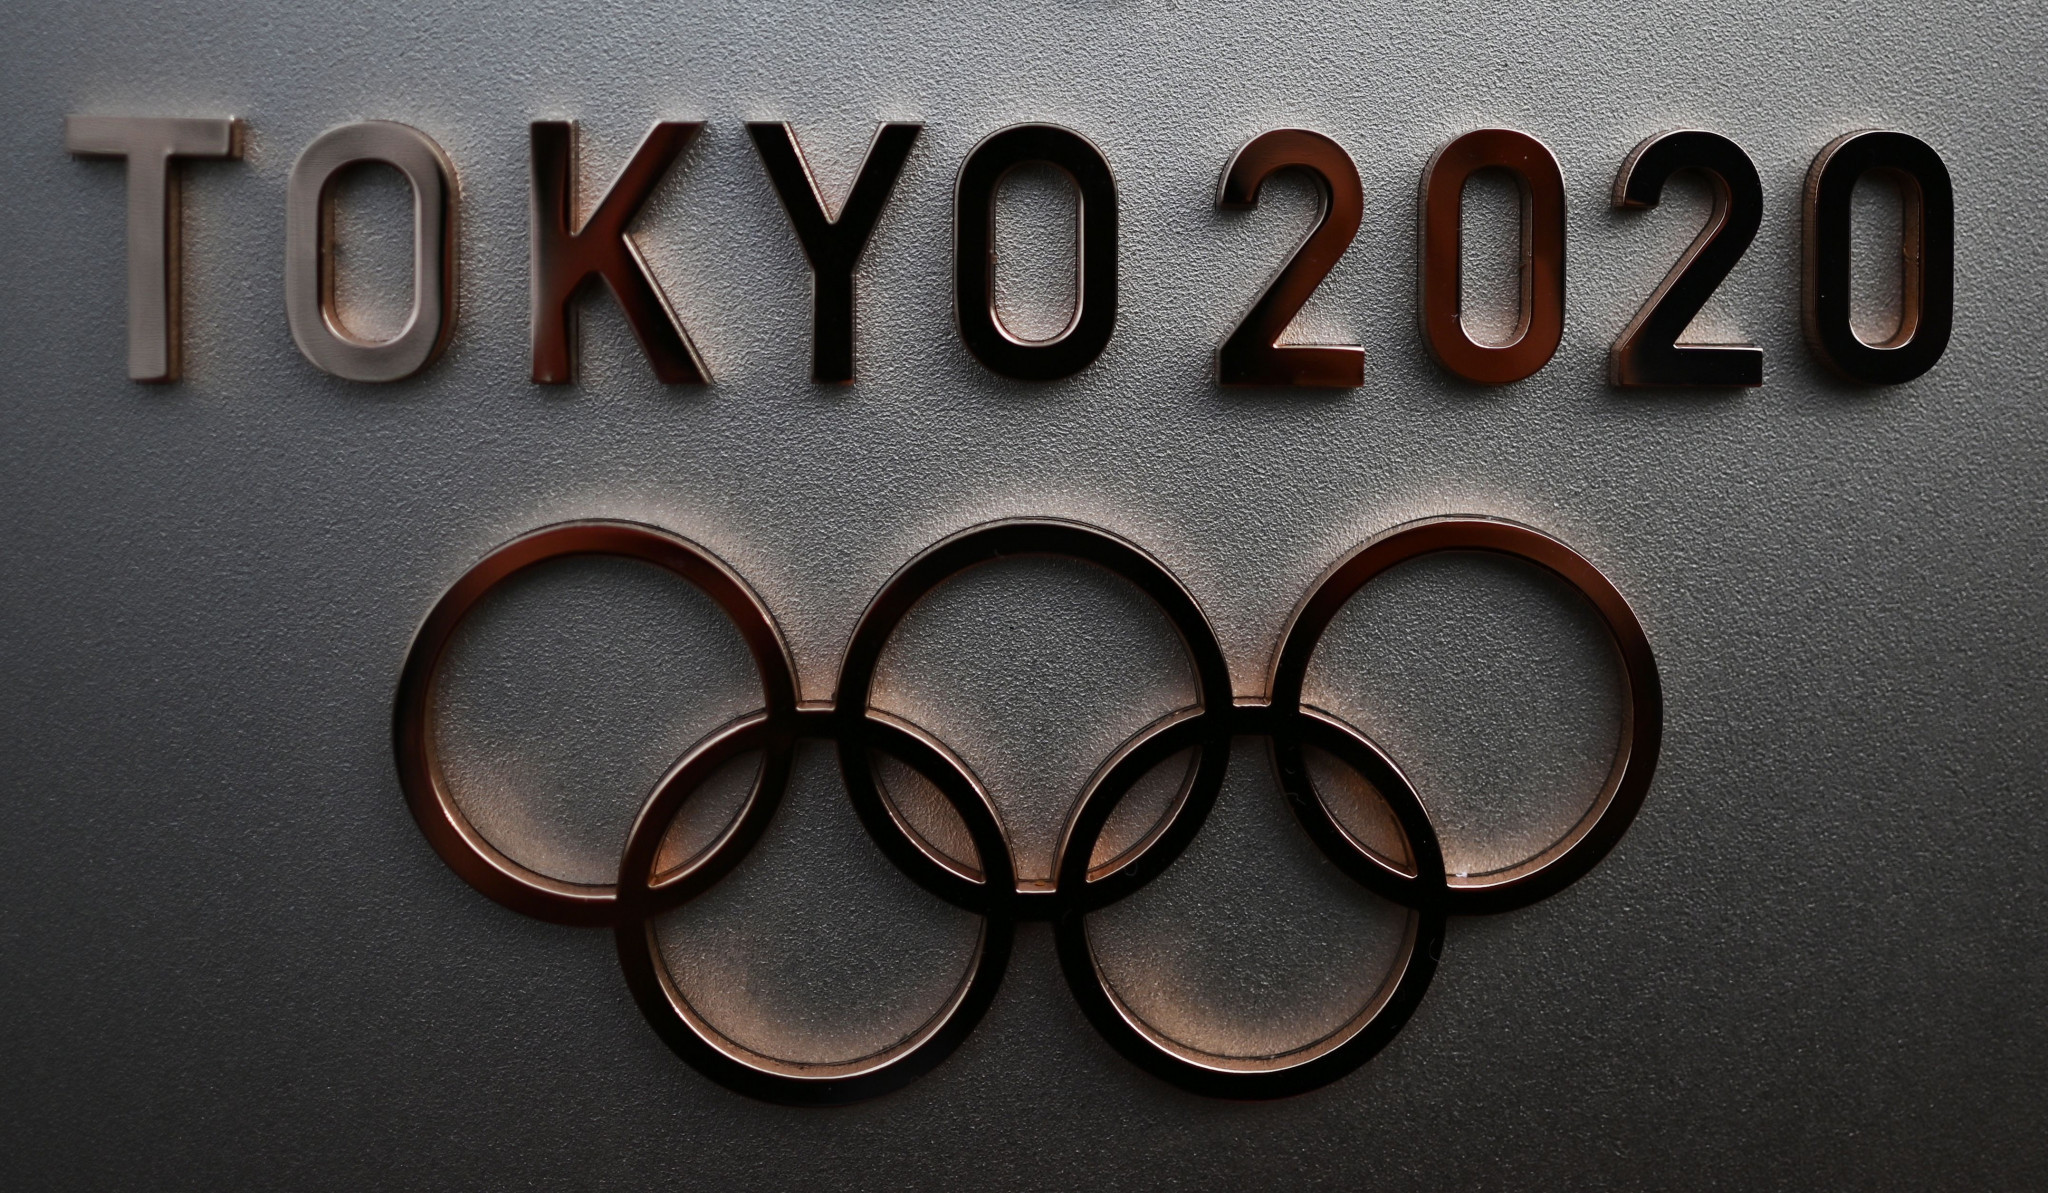 Tokyo 2020 has halted volunteer training due to the coronavirus outbreak ©Getty Images